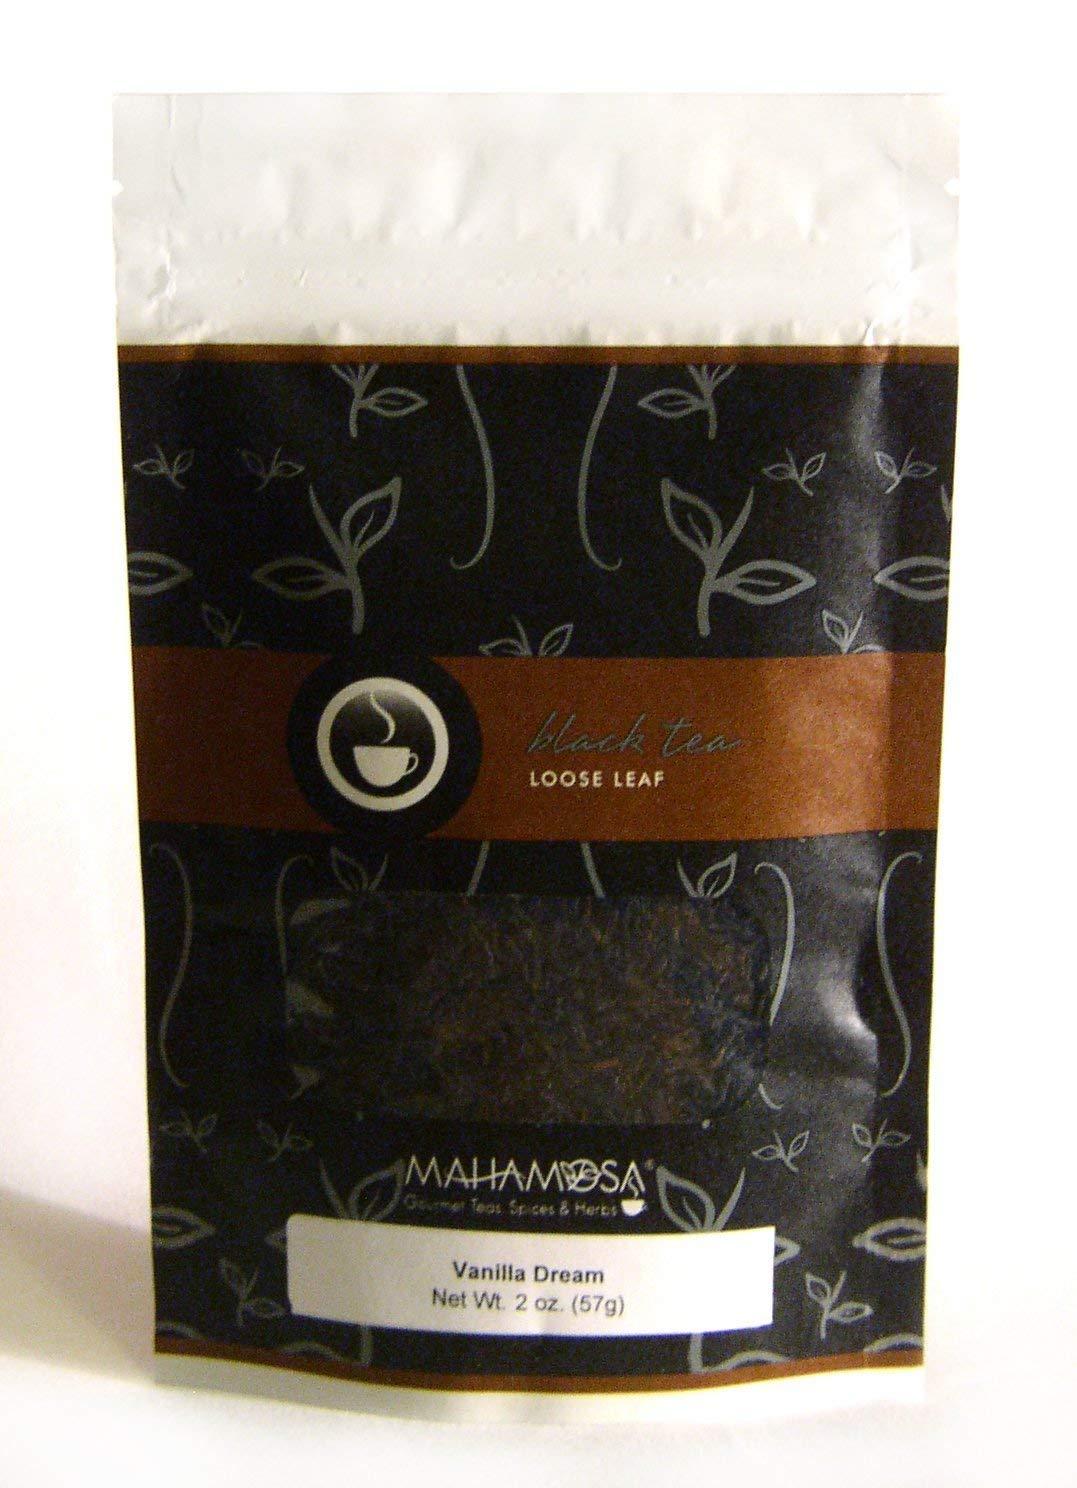 Mahamosa Vanilla Dream Tea 2 oz - Loose Leaf Flavored Black Tea Blend (with black tea, flavoring, vanilla pieces)